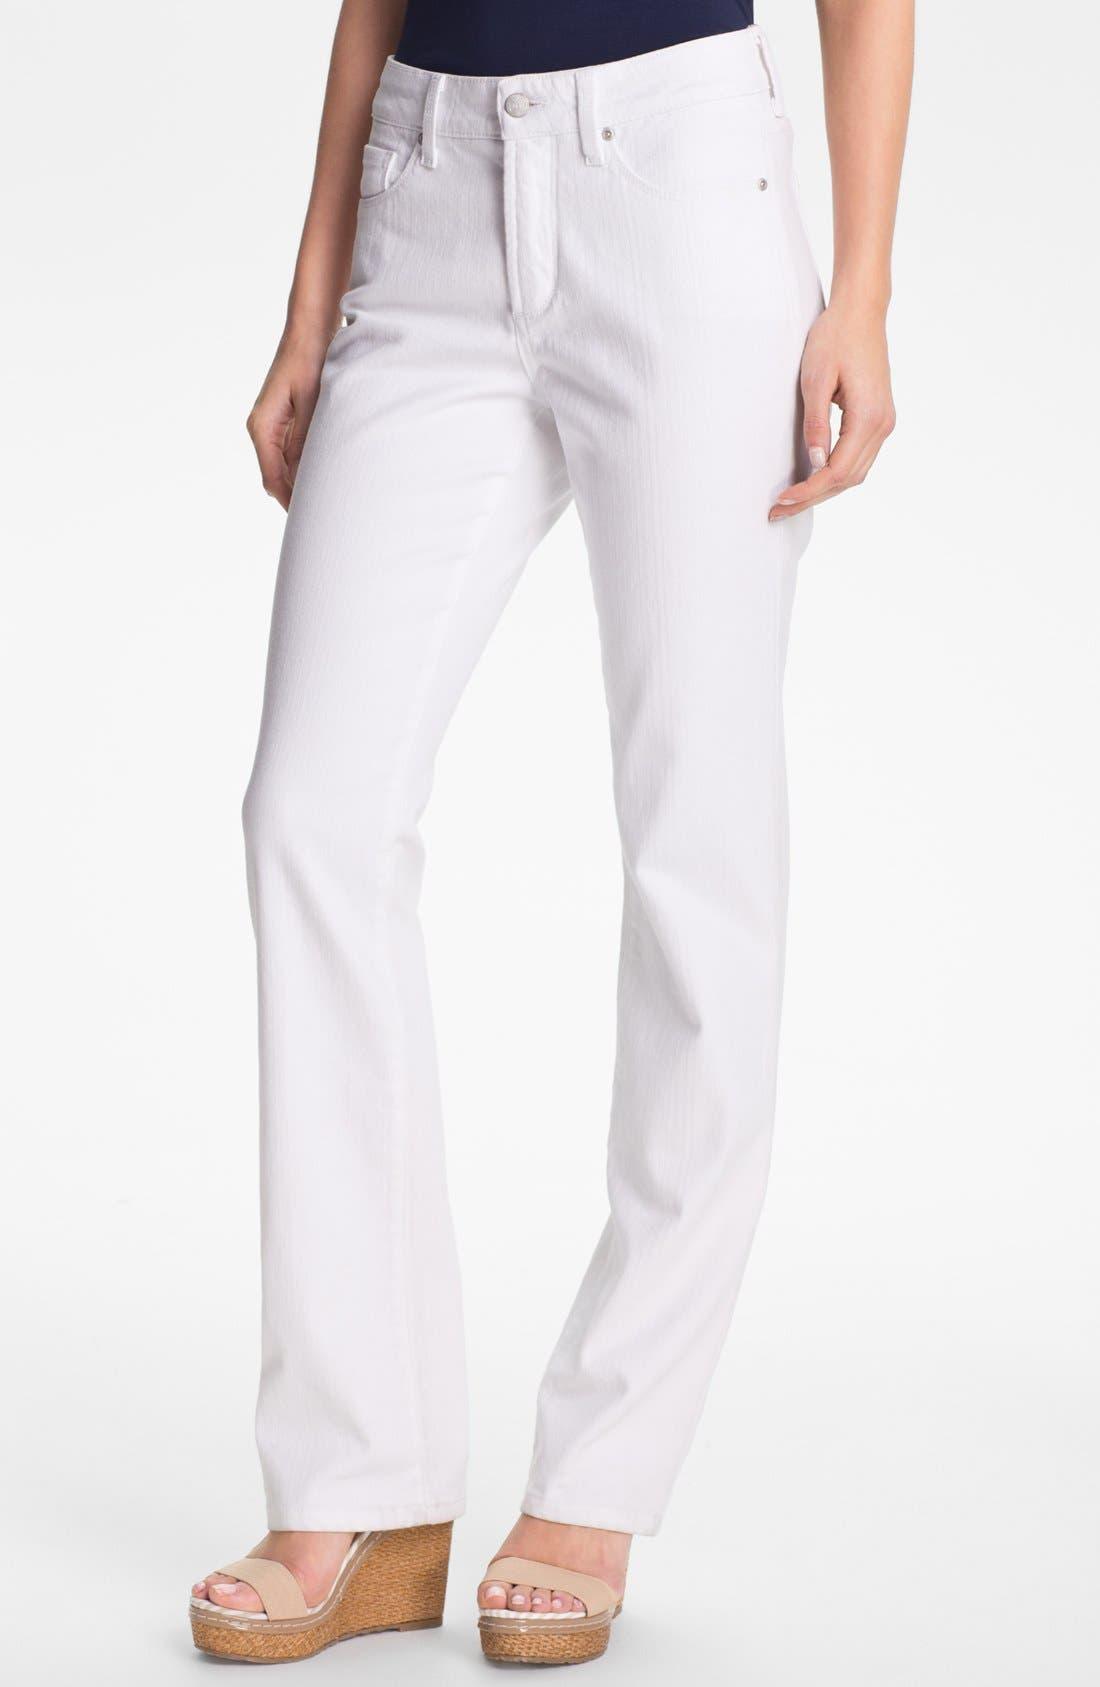 Main Image - NYDJ 'Marilyn' Straight Leg Stretch Jeans (Petite)